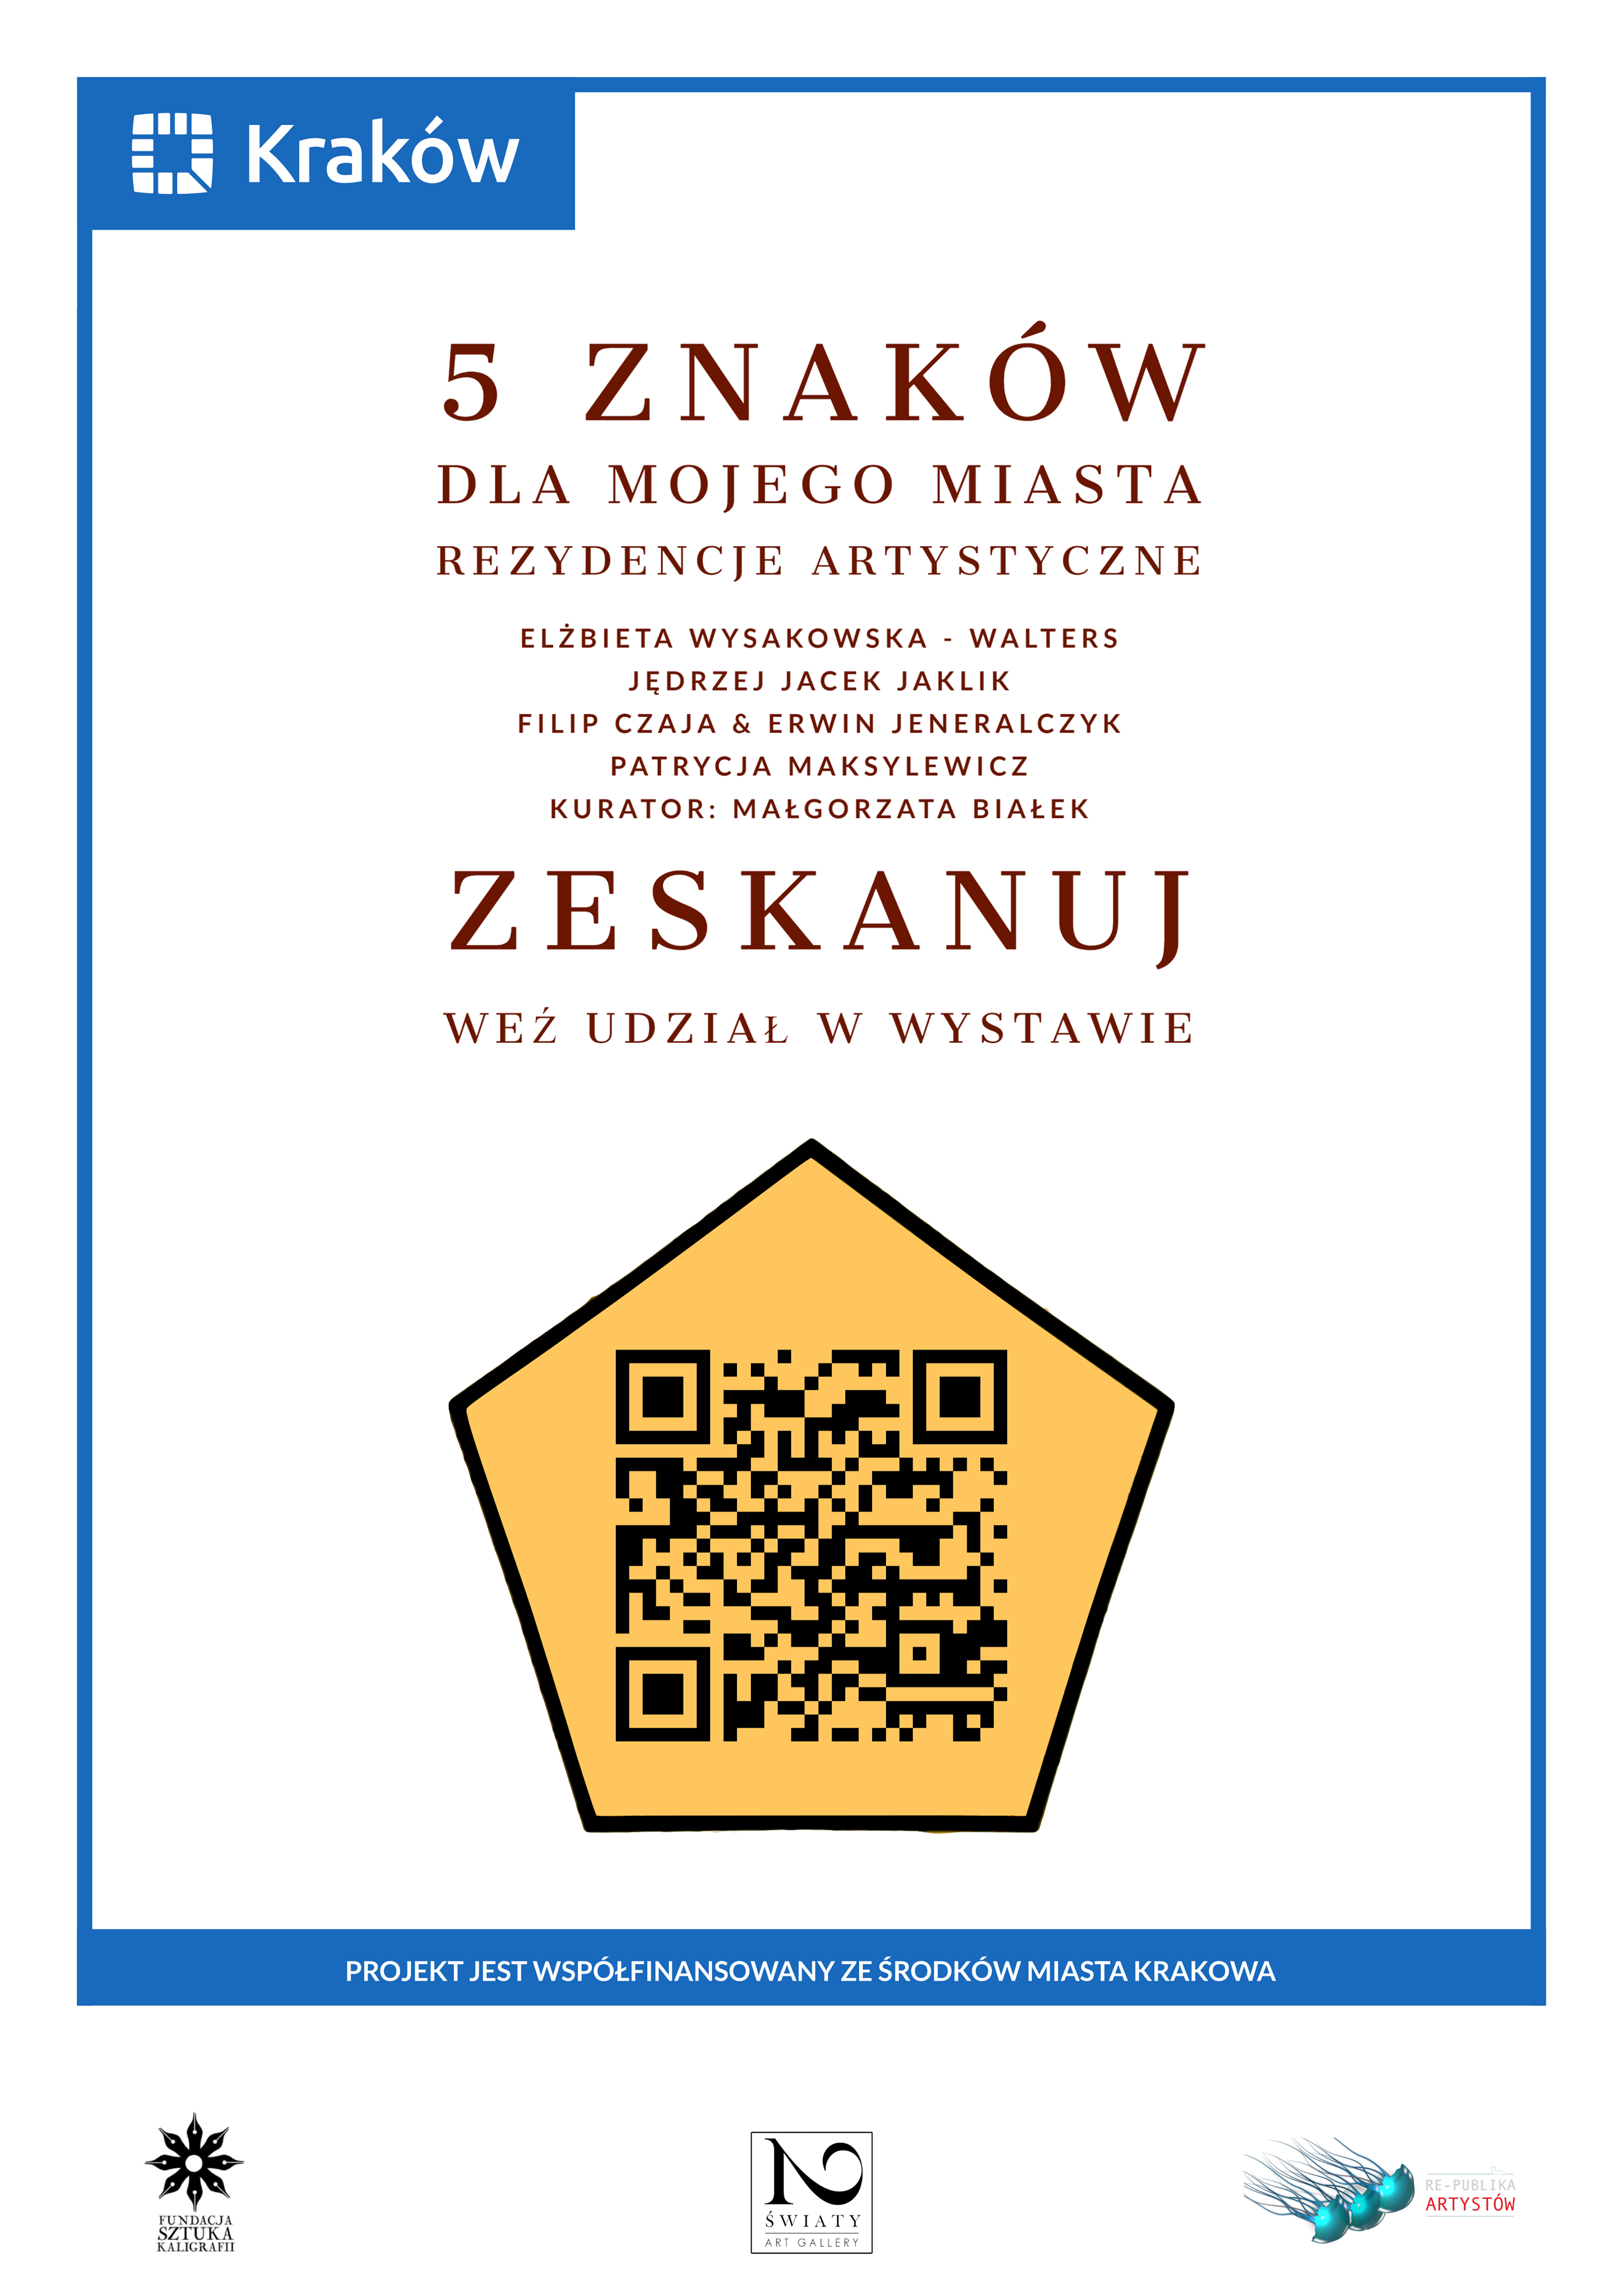 Rezydencja Artystyczna plakat